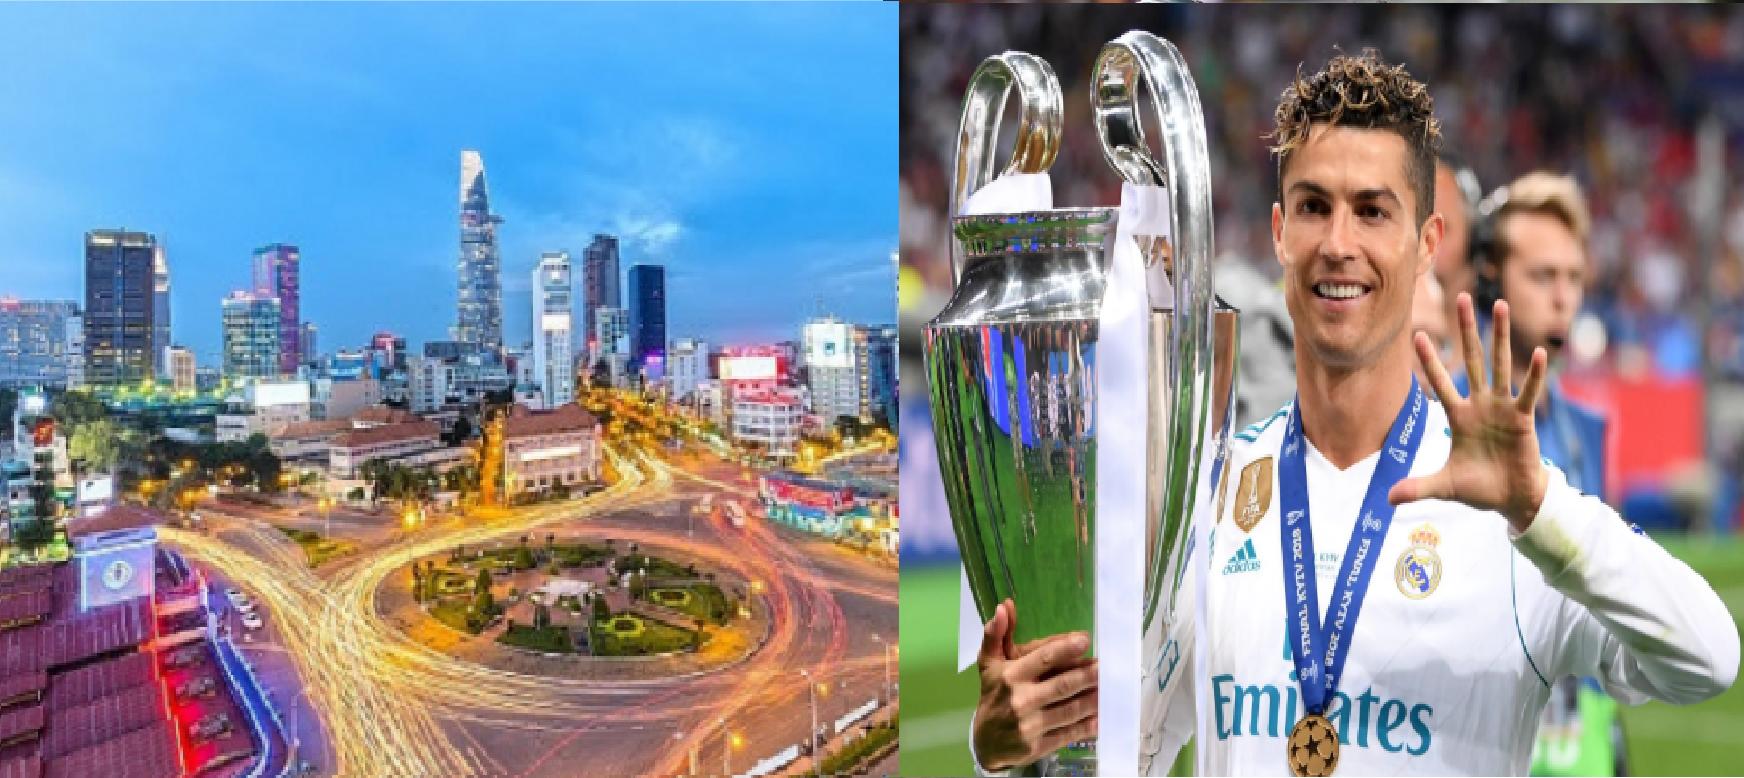 cristiano ronaldo vietnam is developing its economy like his football playing